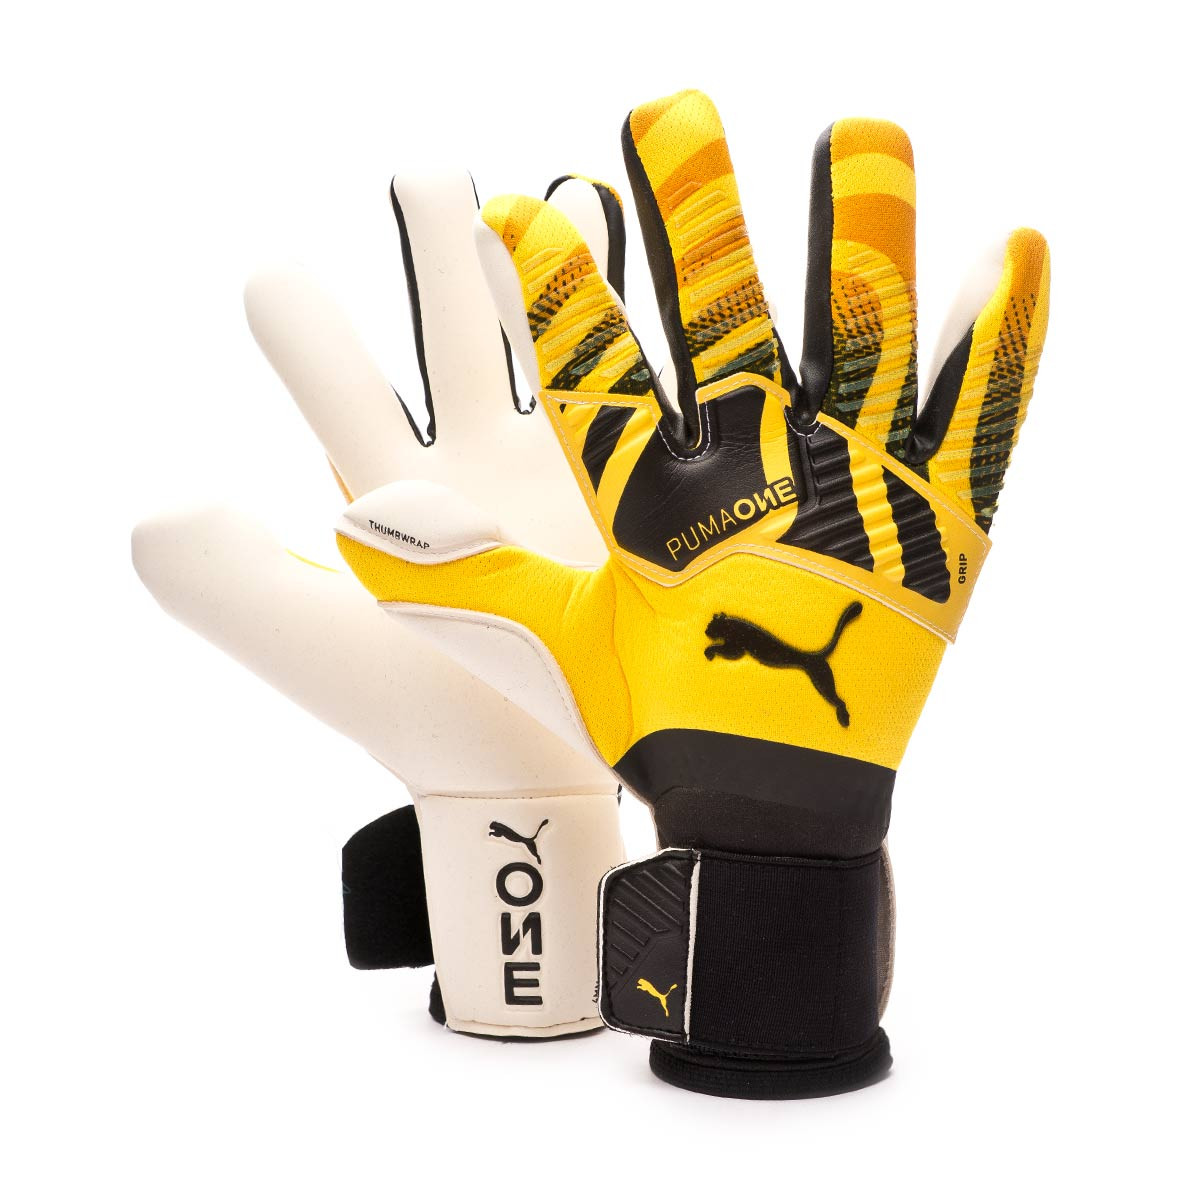 Puma One Grip 1 Hybrid Pro Glove